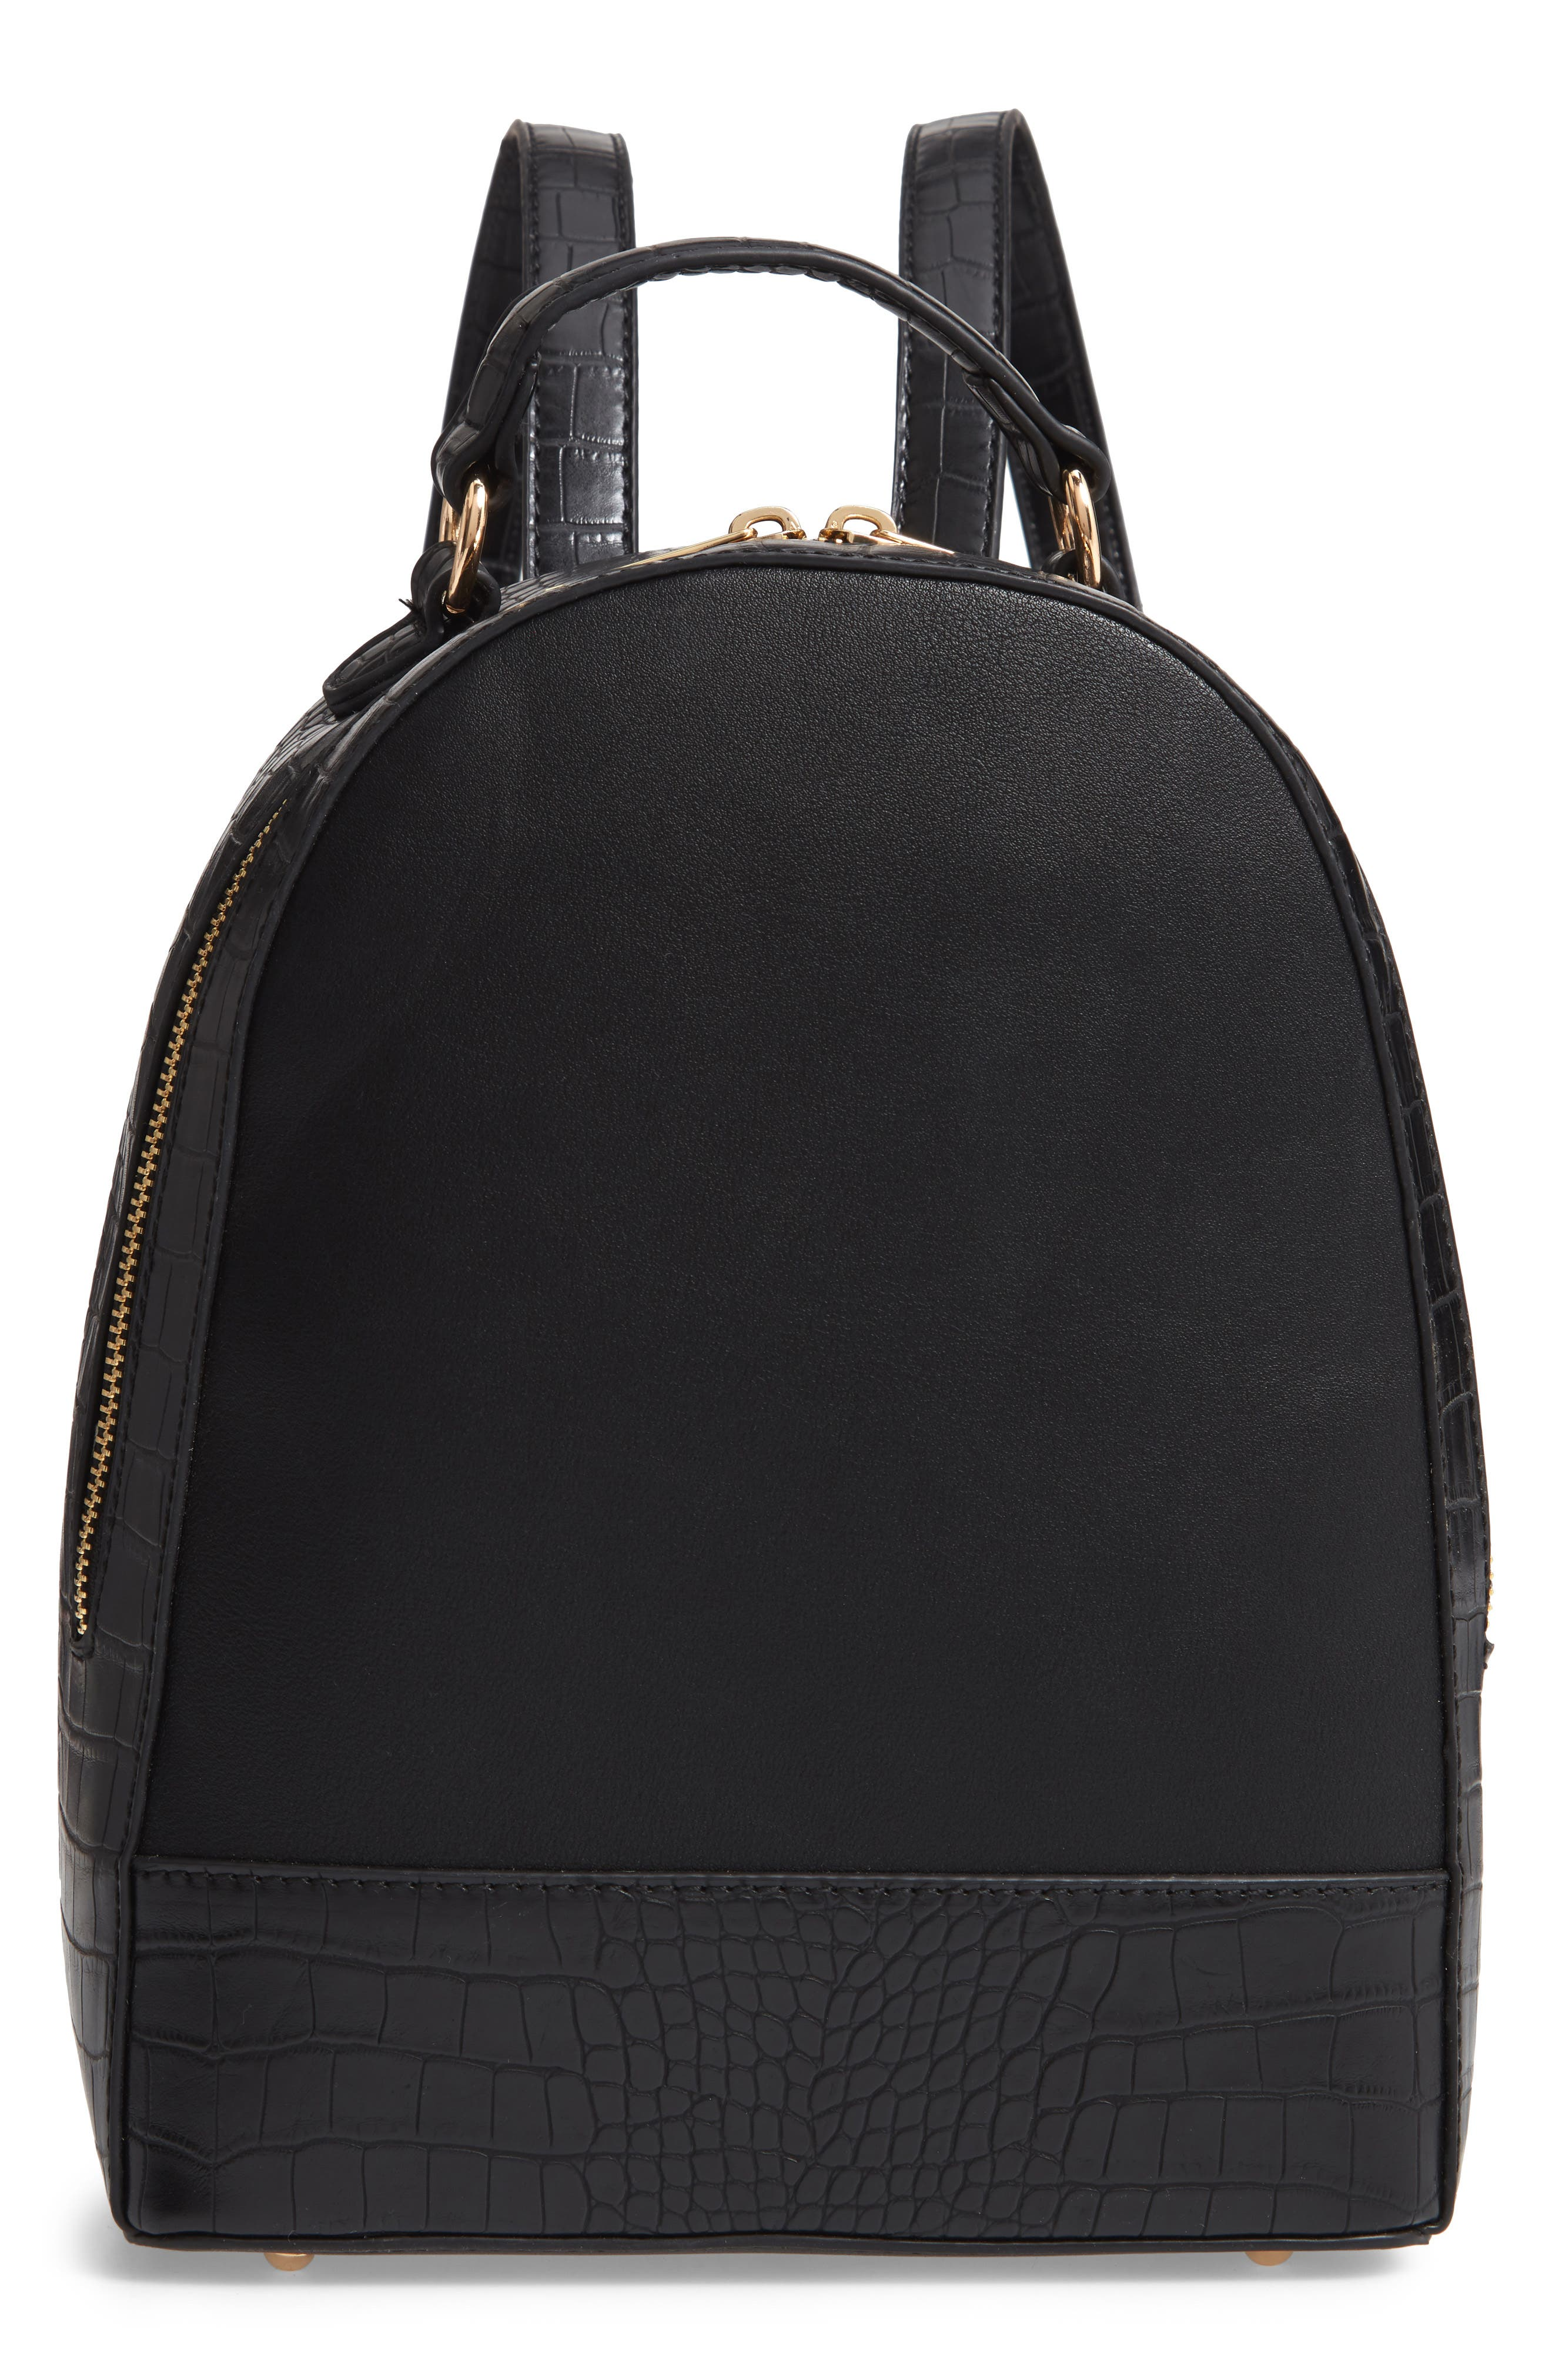 Jamya Croc Embossed Faux Leather Backpack,                         Main,                         color, BLACK